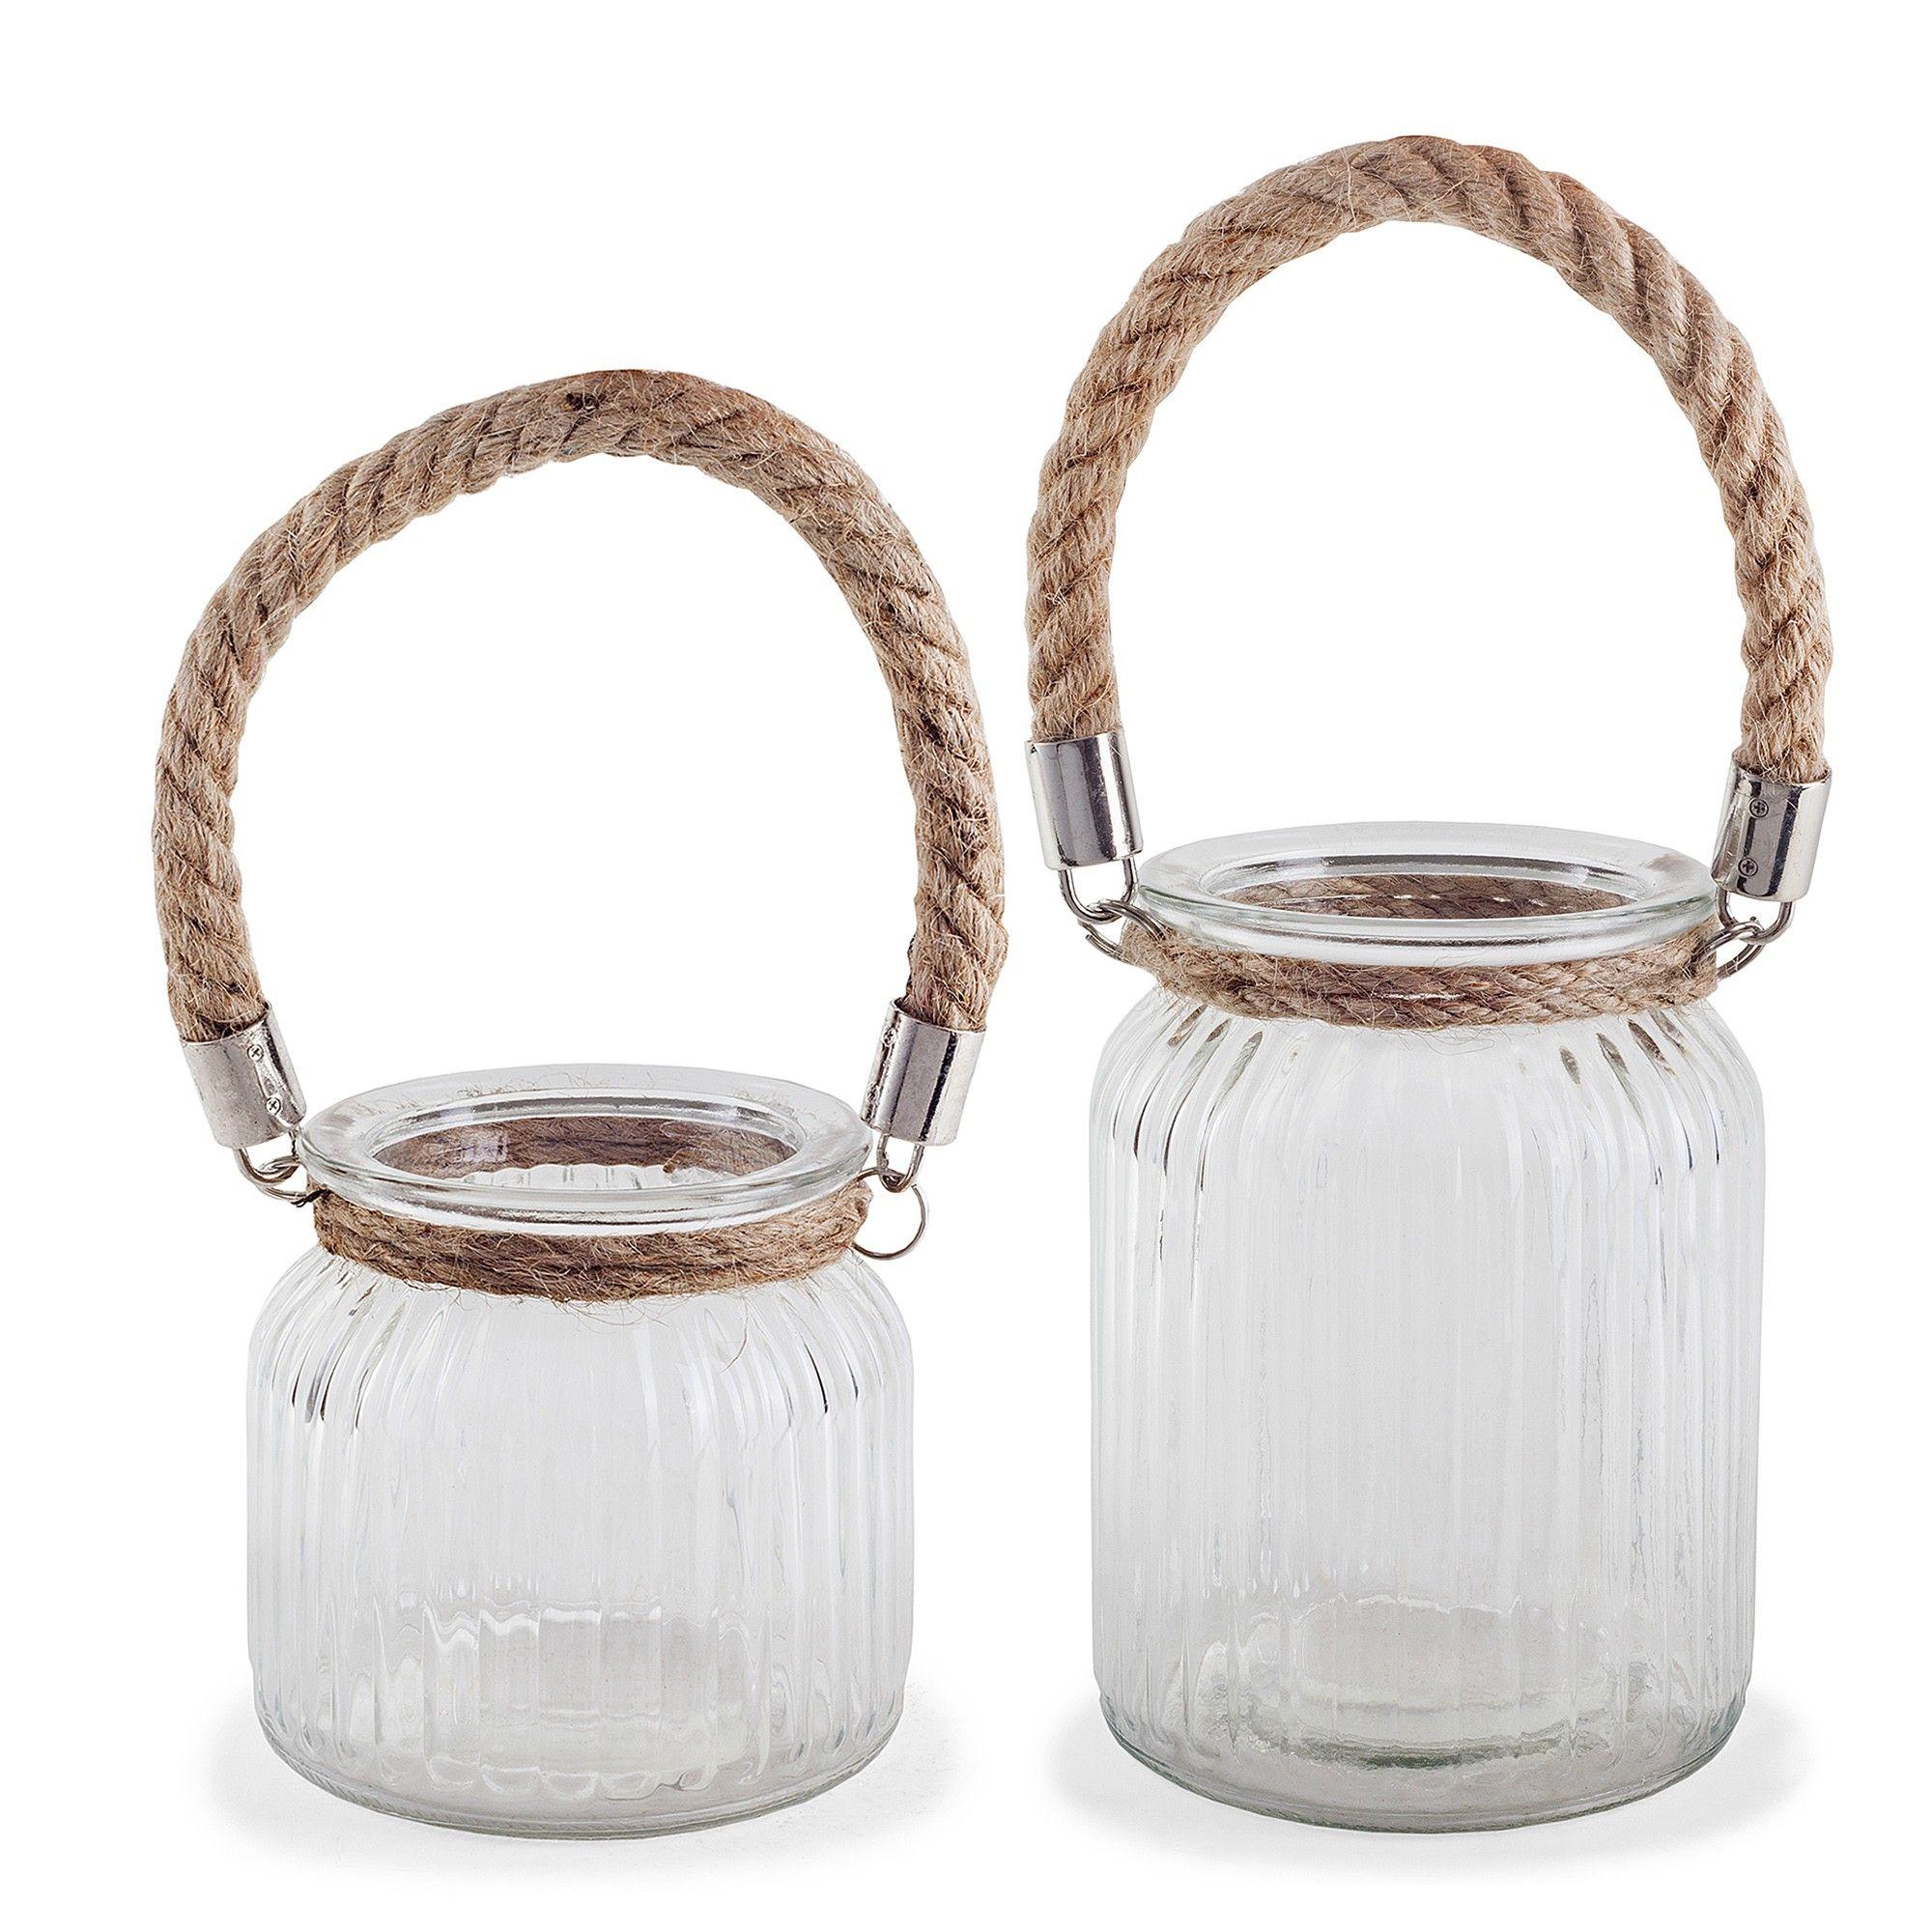 Glass Windlights Coastal Design Glass Windlight Candle Holders Glass Jar Candles Large Glass Bottle Nautical Glass